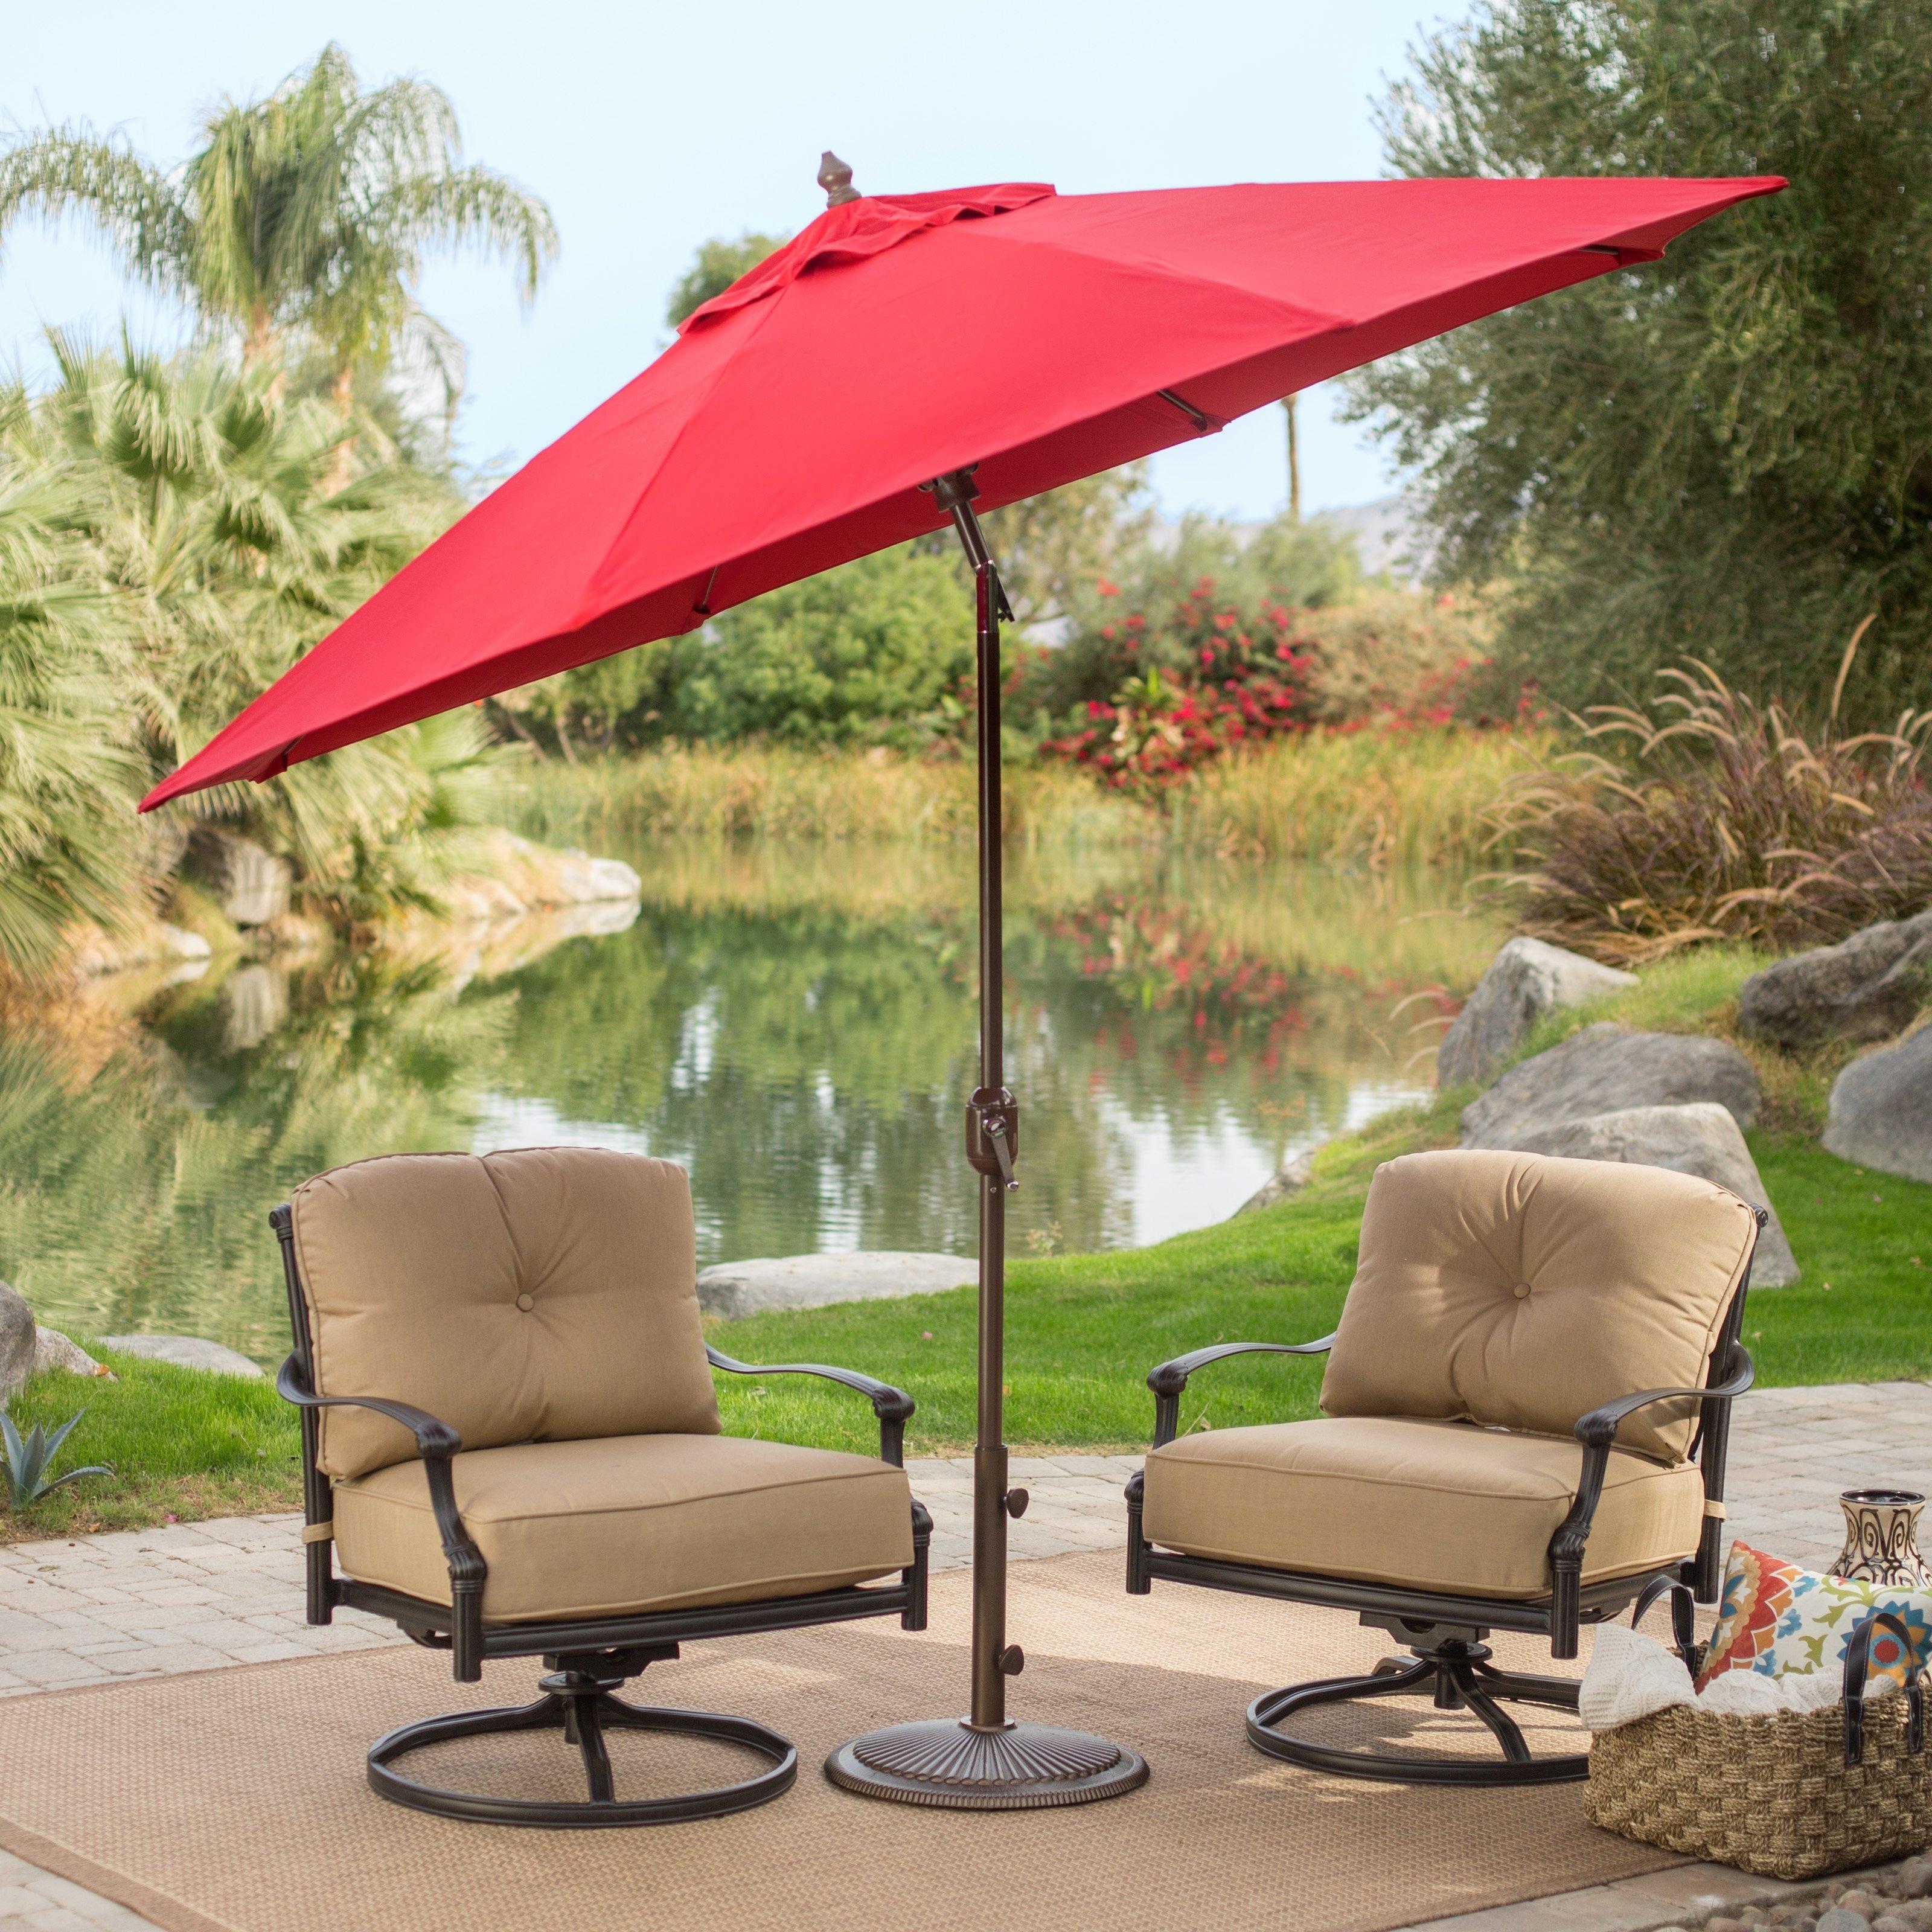 Sunbrella Outdoor Patio Umbrellas With Regard To Fashionable Coral Coast 9 Ft (View 15 of 20)